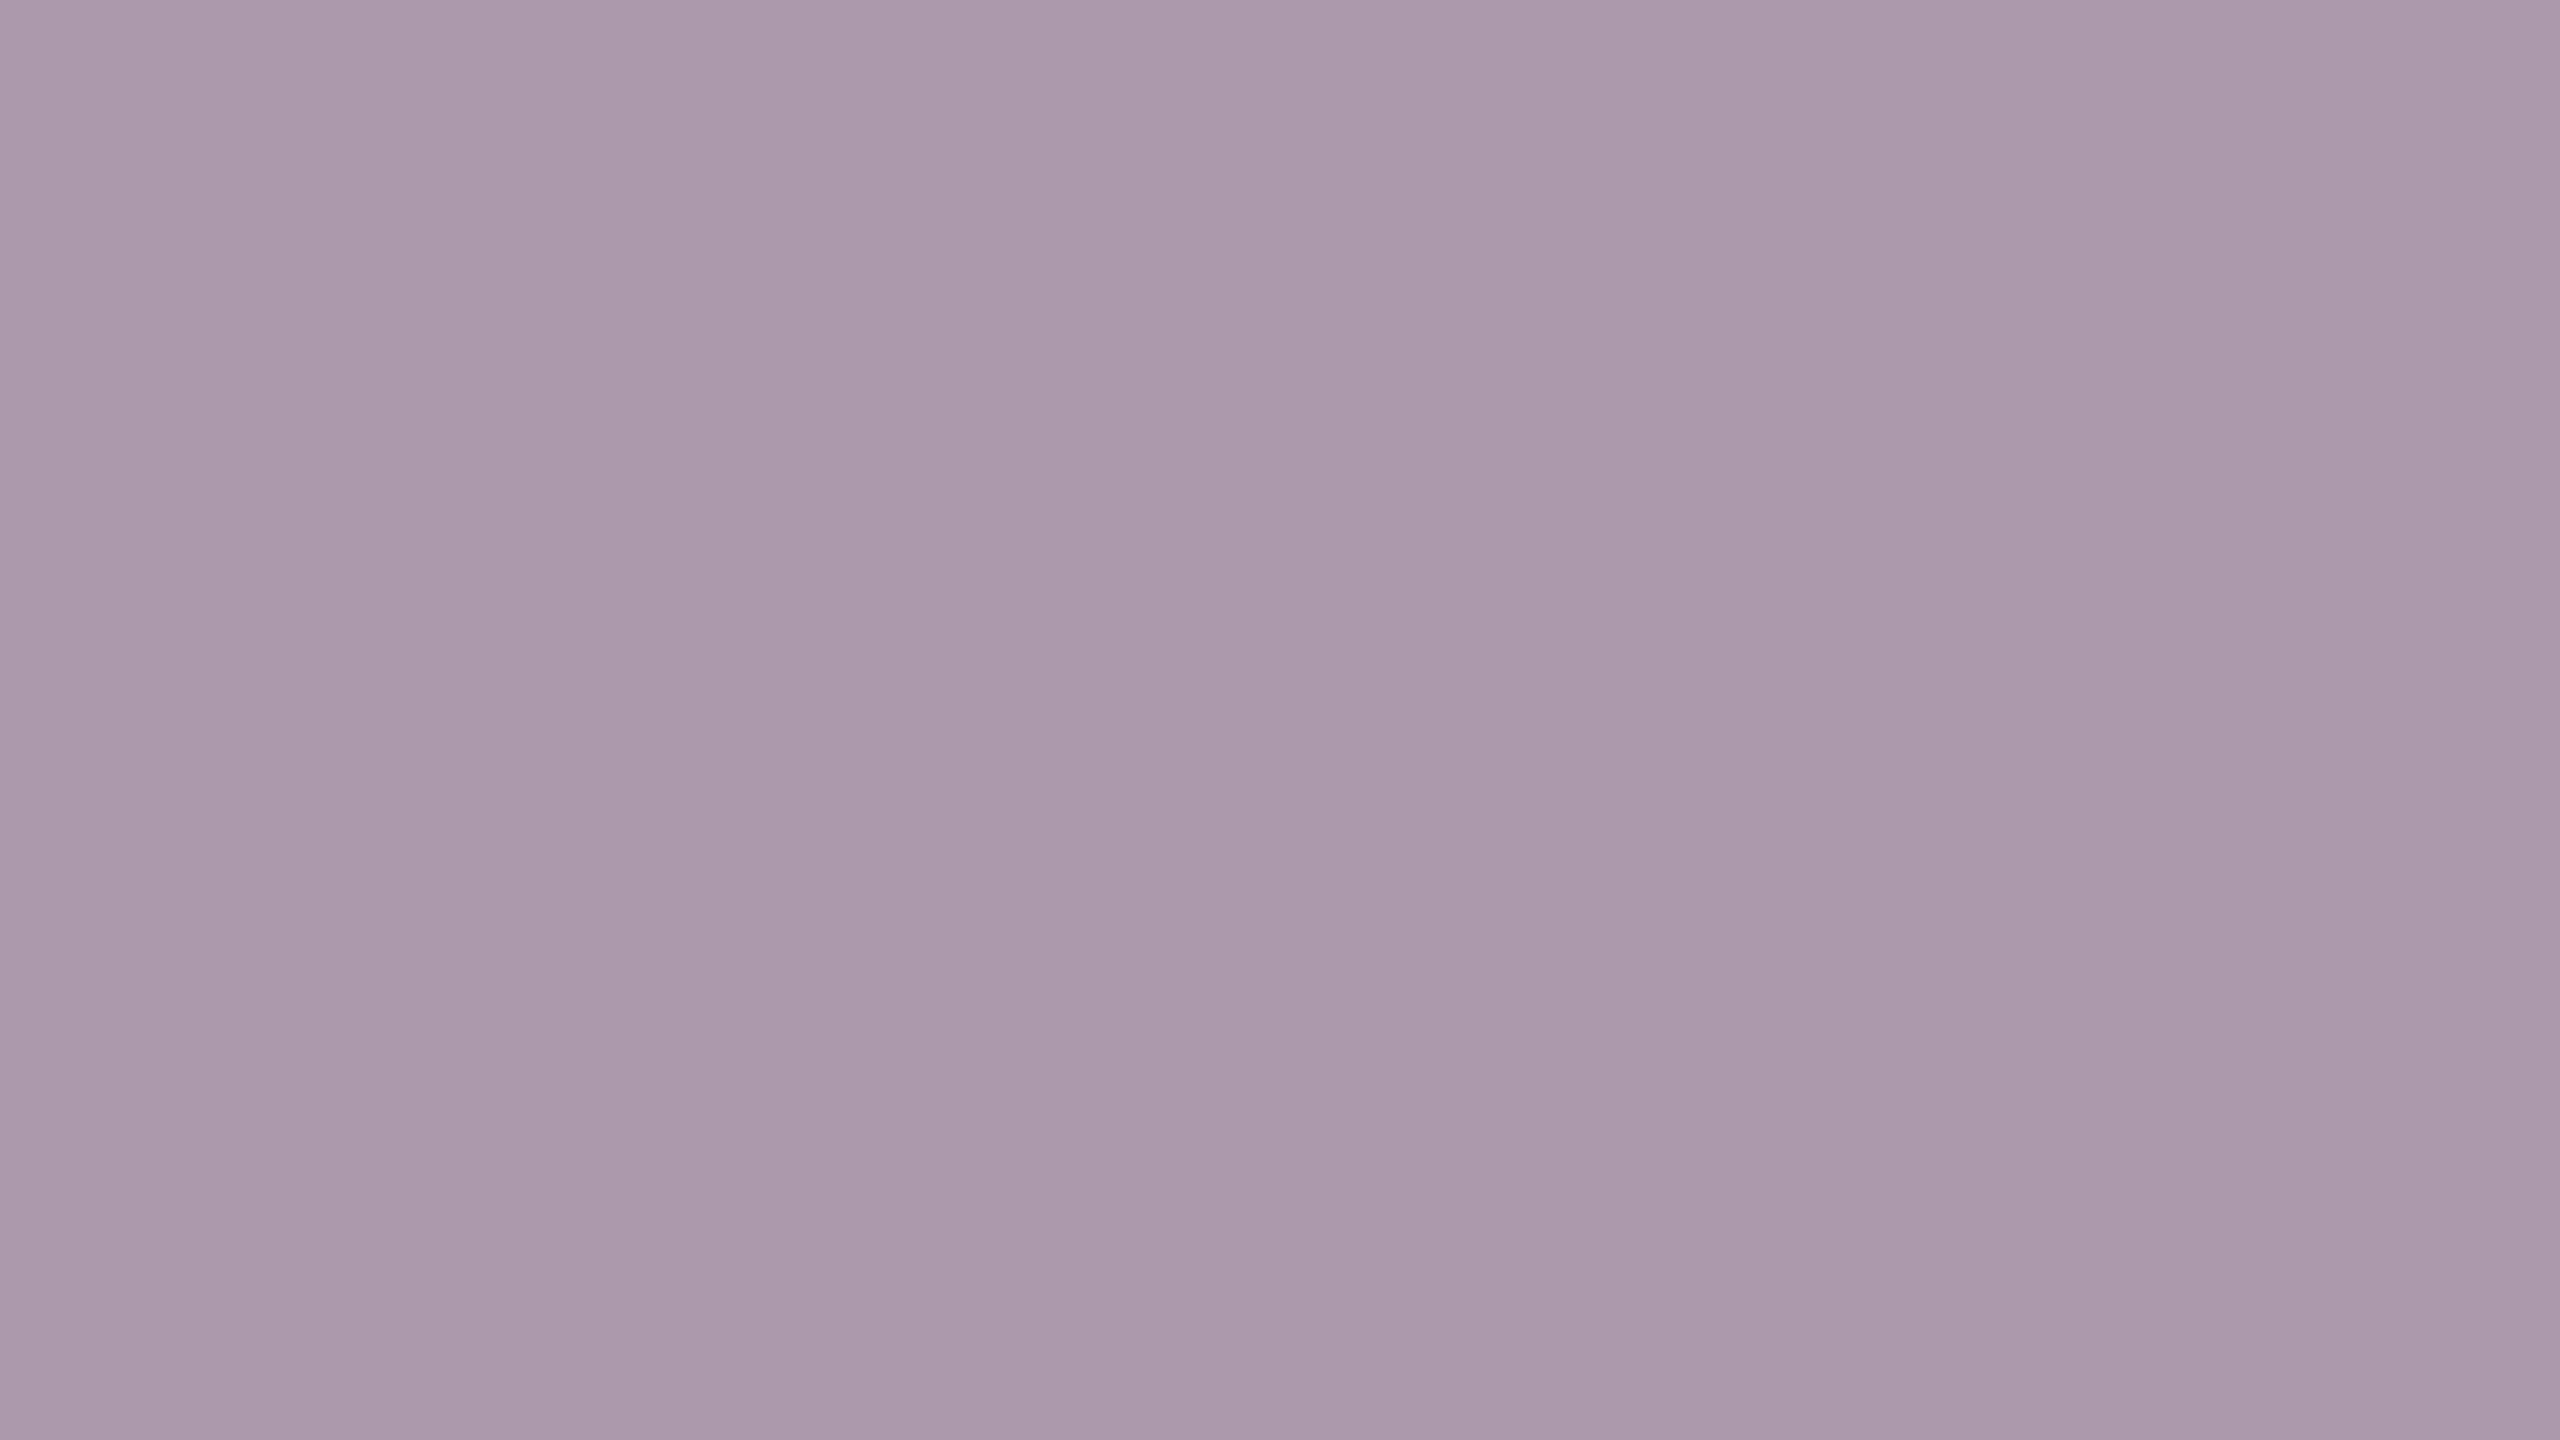 2560x1440 Rose Quartz Solid Color Background